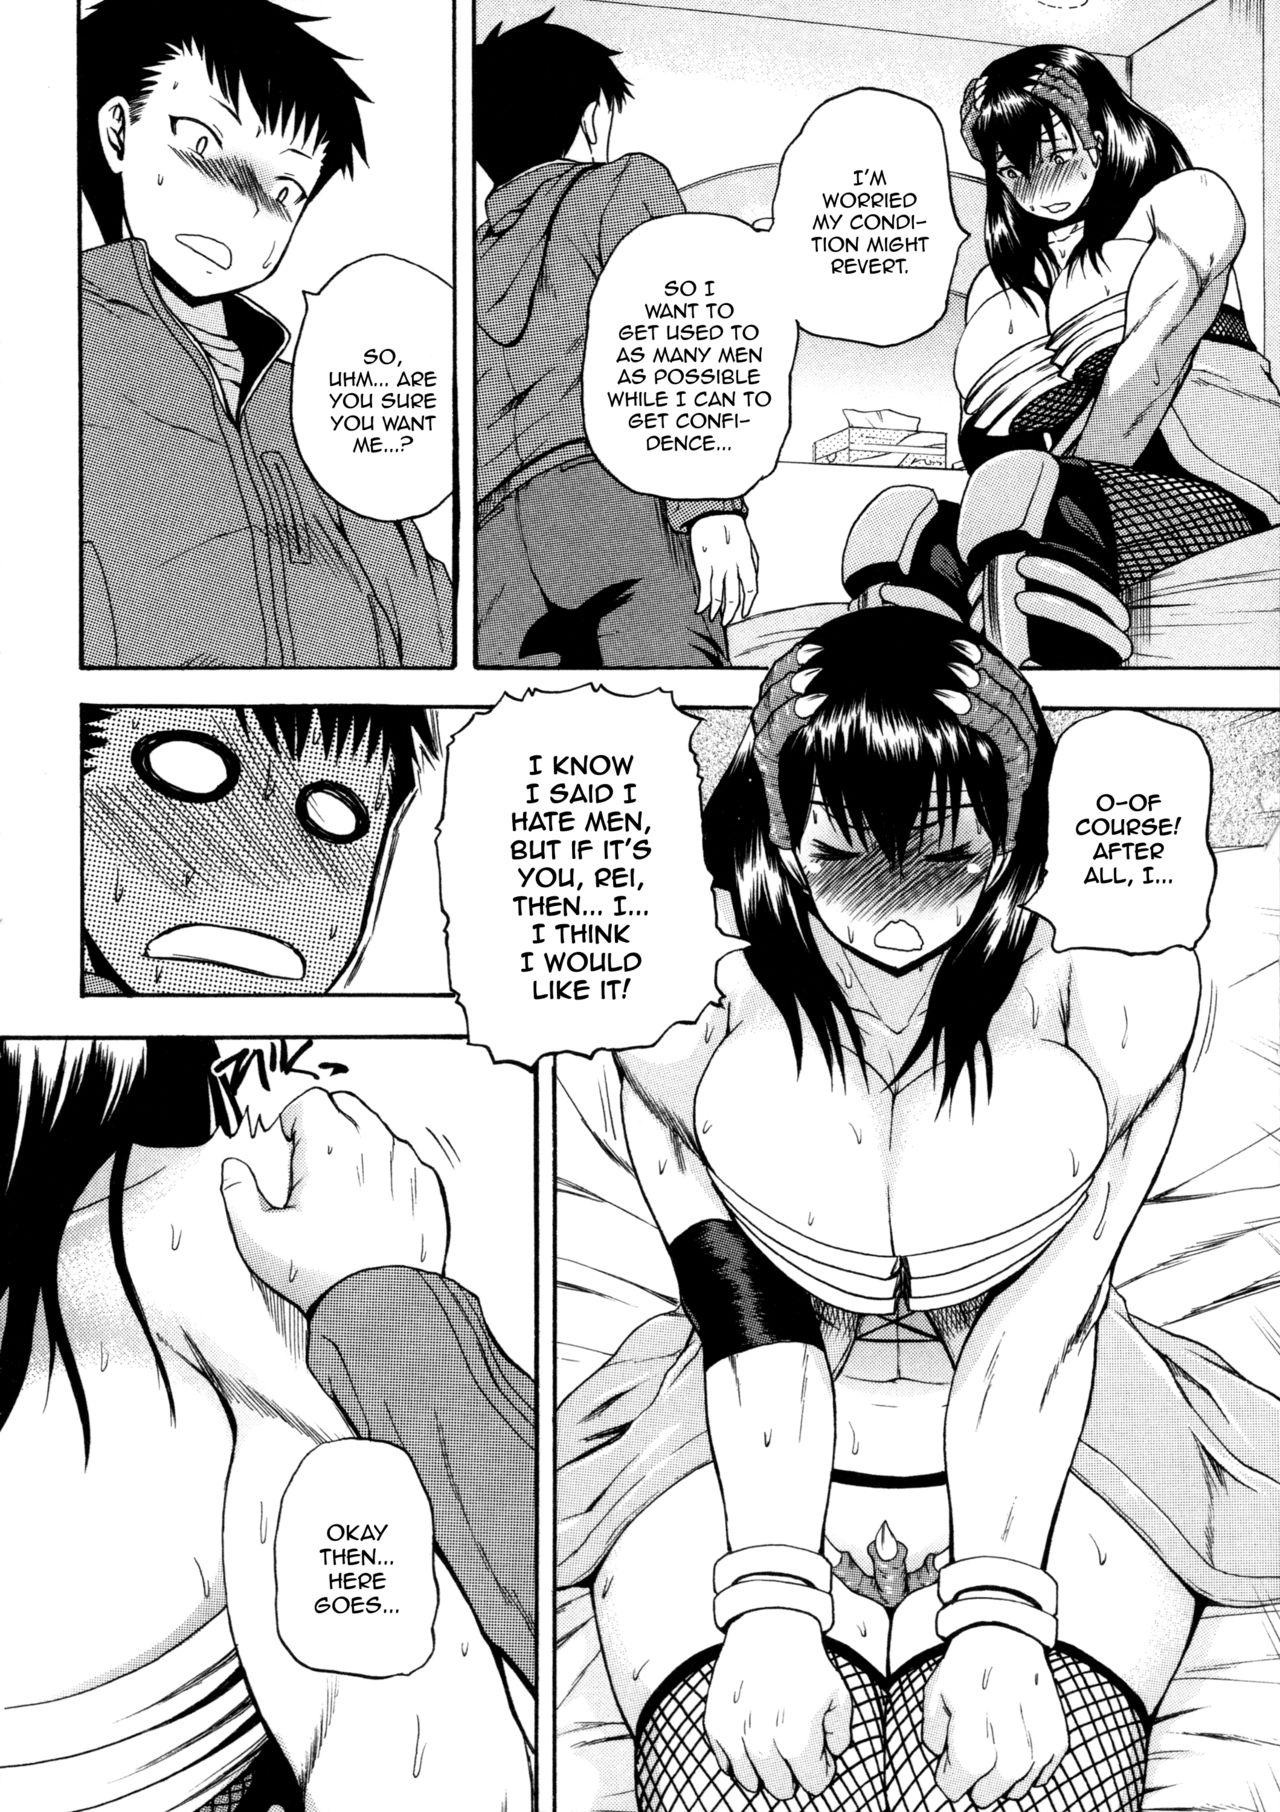 [Yoshimura Tatsumaki] Monzetsu Taigatame ~Count 3 de Ikasete Ageru~ | Faint in Agony Bodylock ~I'll make you cum on the count of 3~ [English] [Brolen] 172